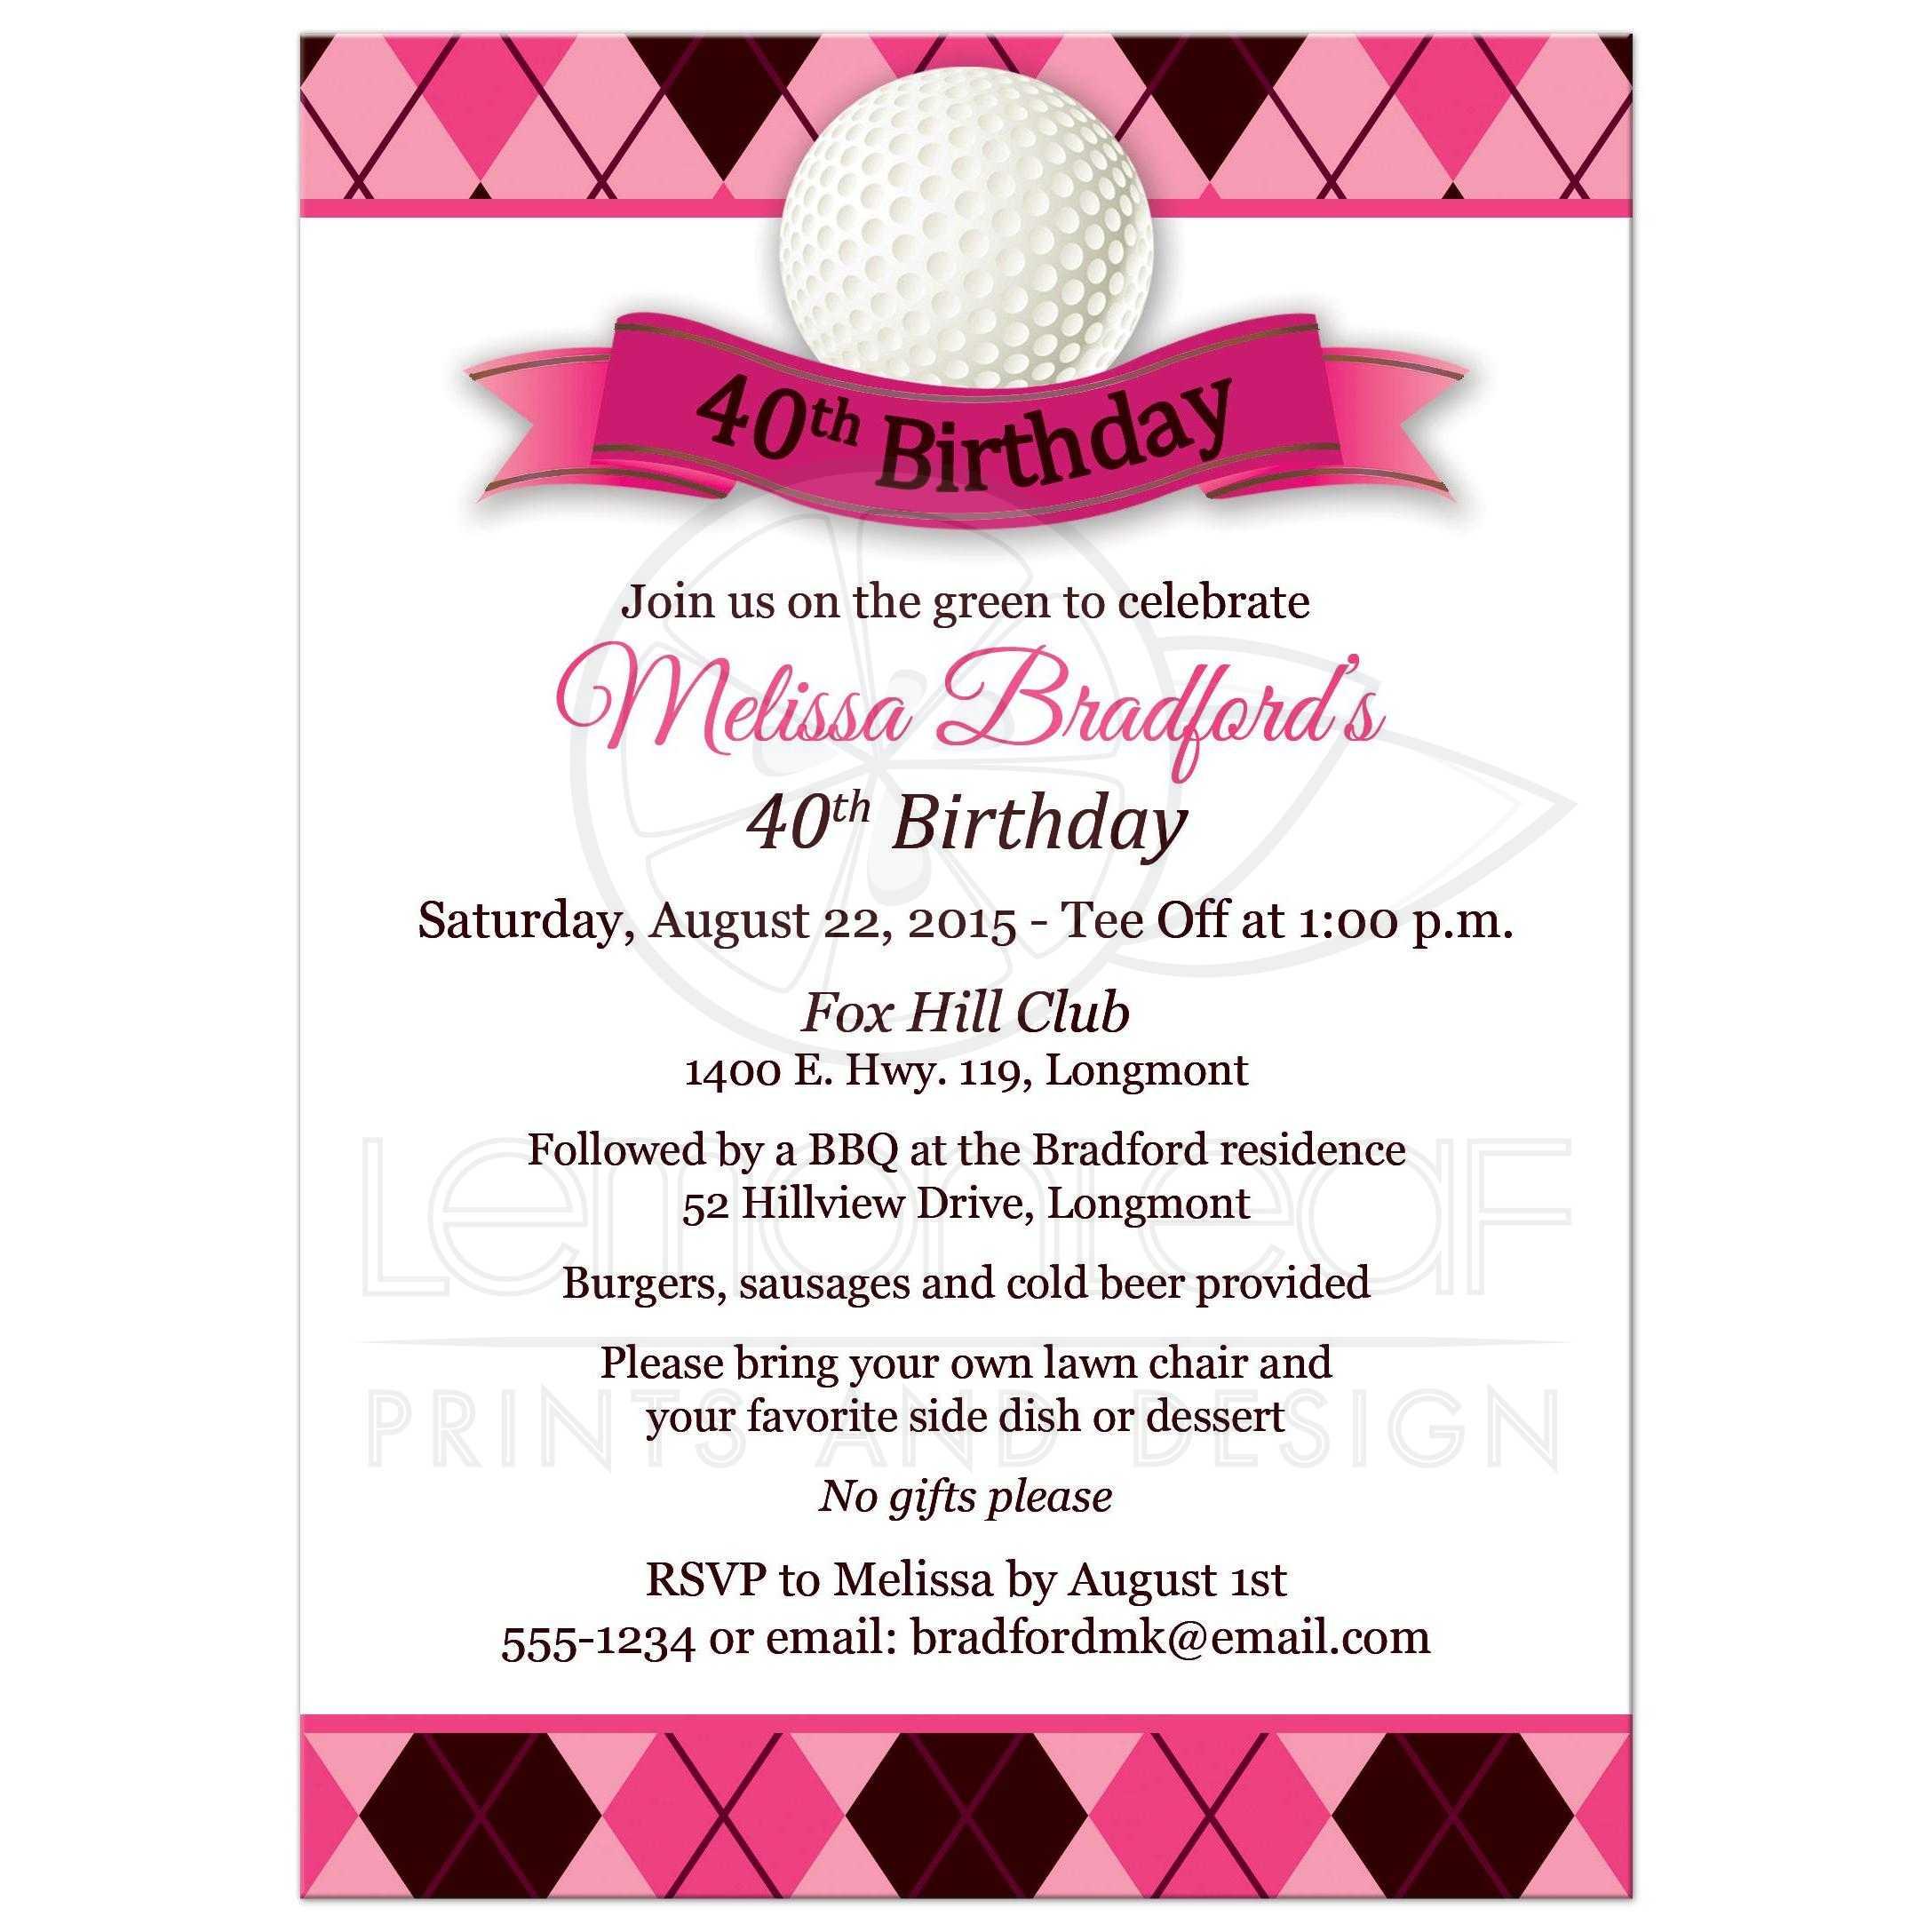 40th birthday party invitation golf theme pink black white argyle plaid golf ball